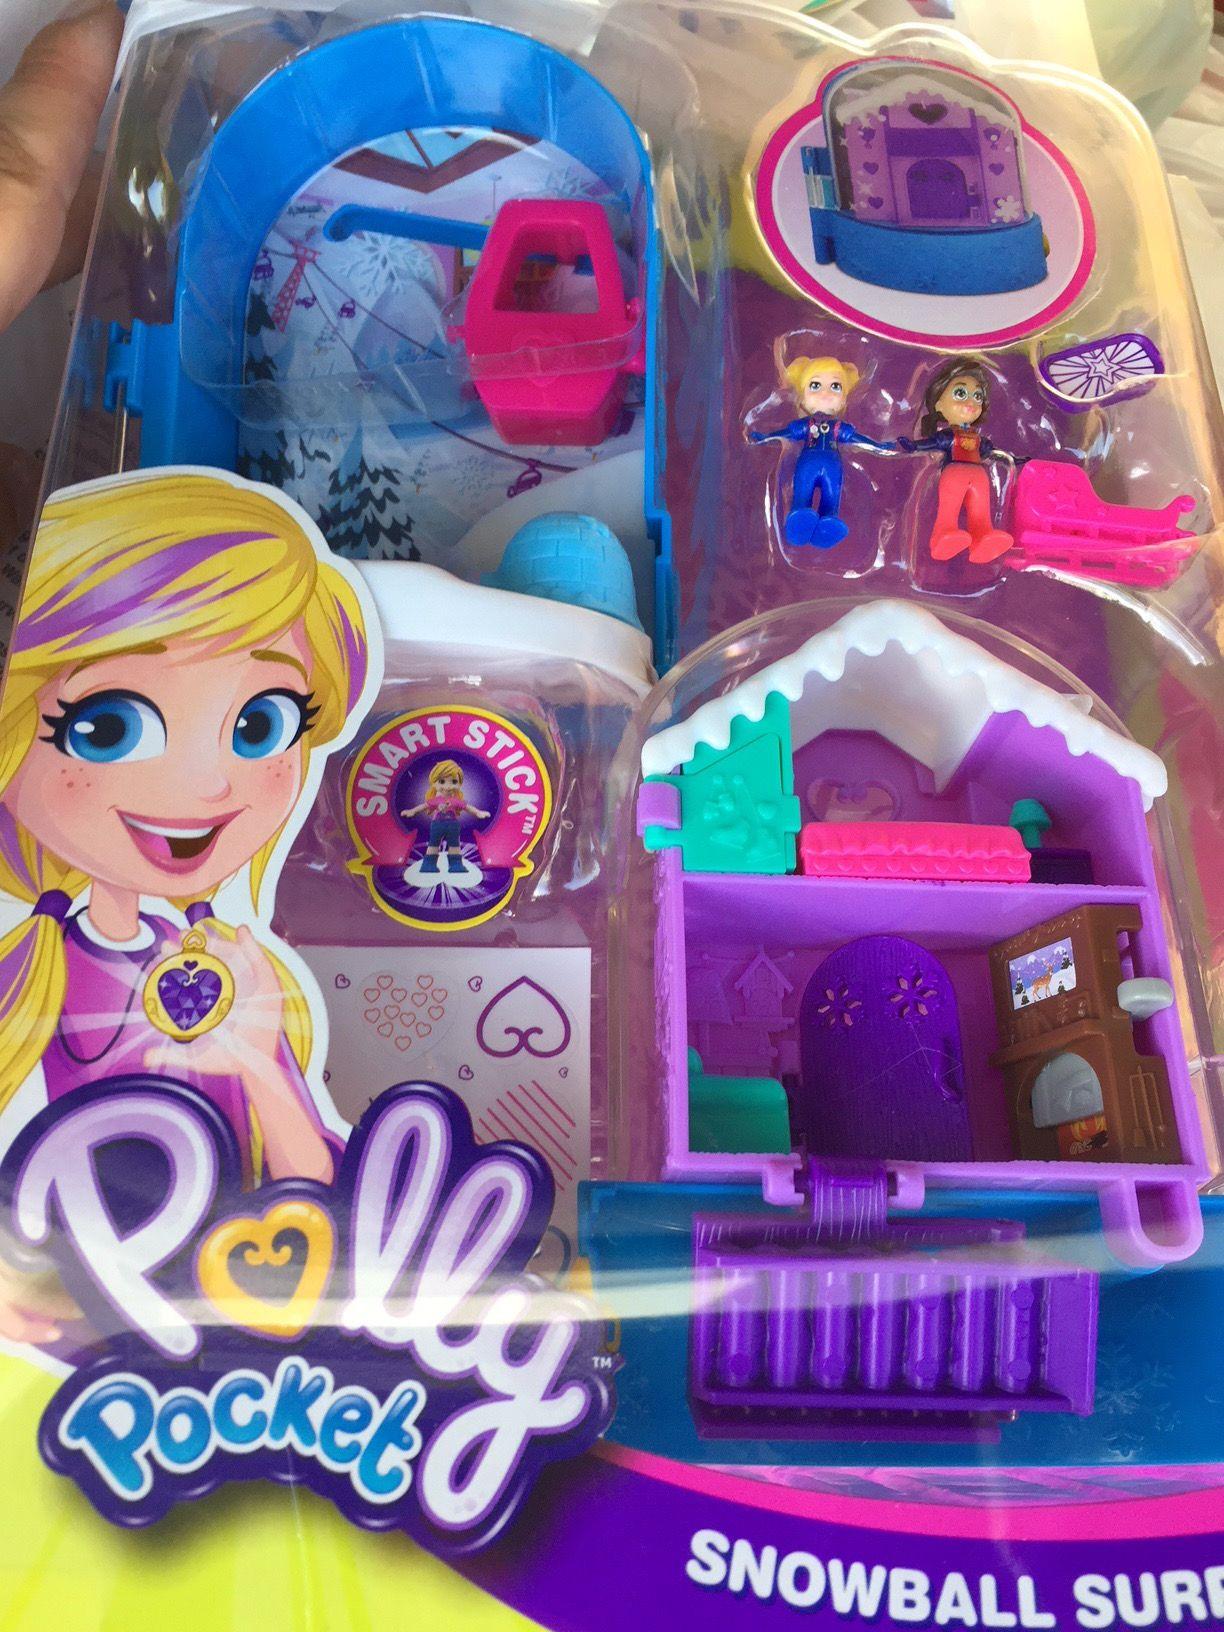 Polly Pocket 2018 At Walmart Polly Pocket Walmart Toys